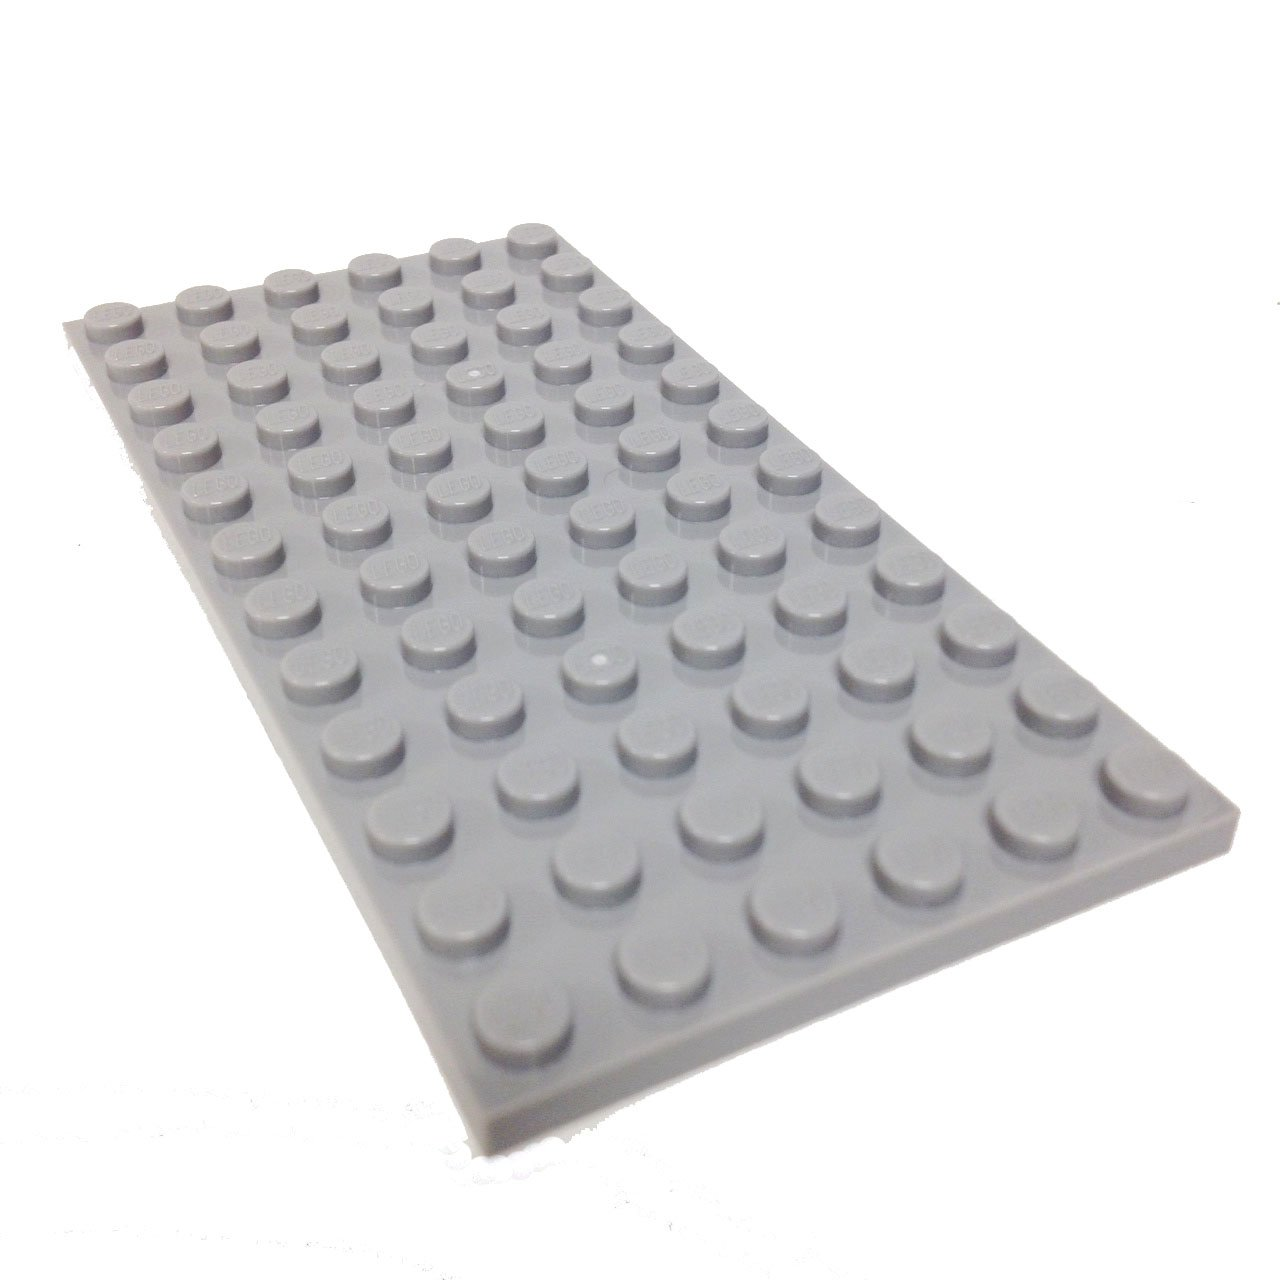 LEGO Dark Tan 6x12 Plate Piece